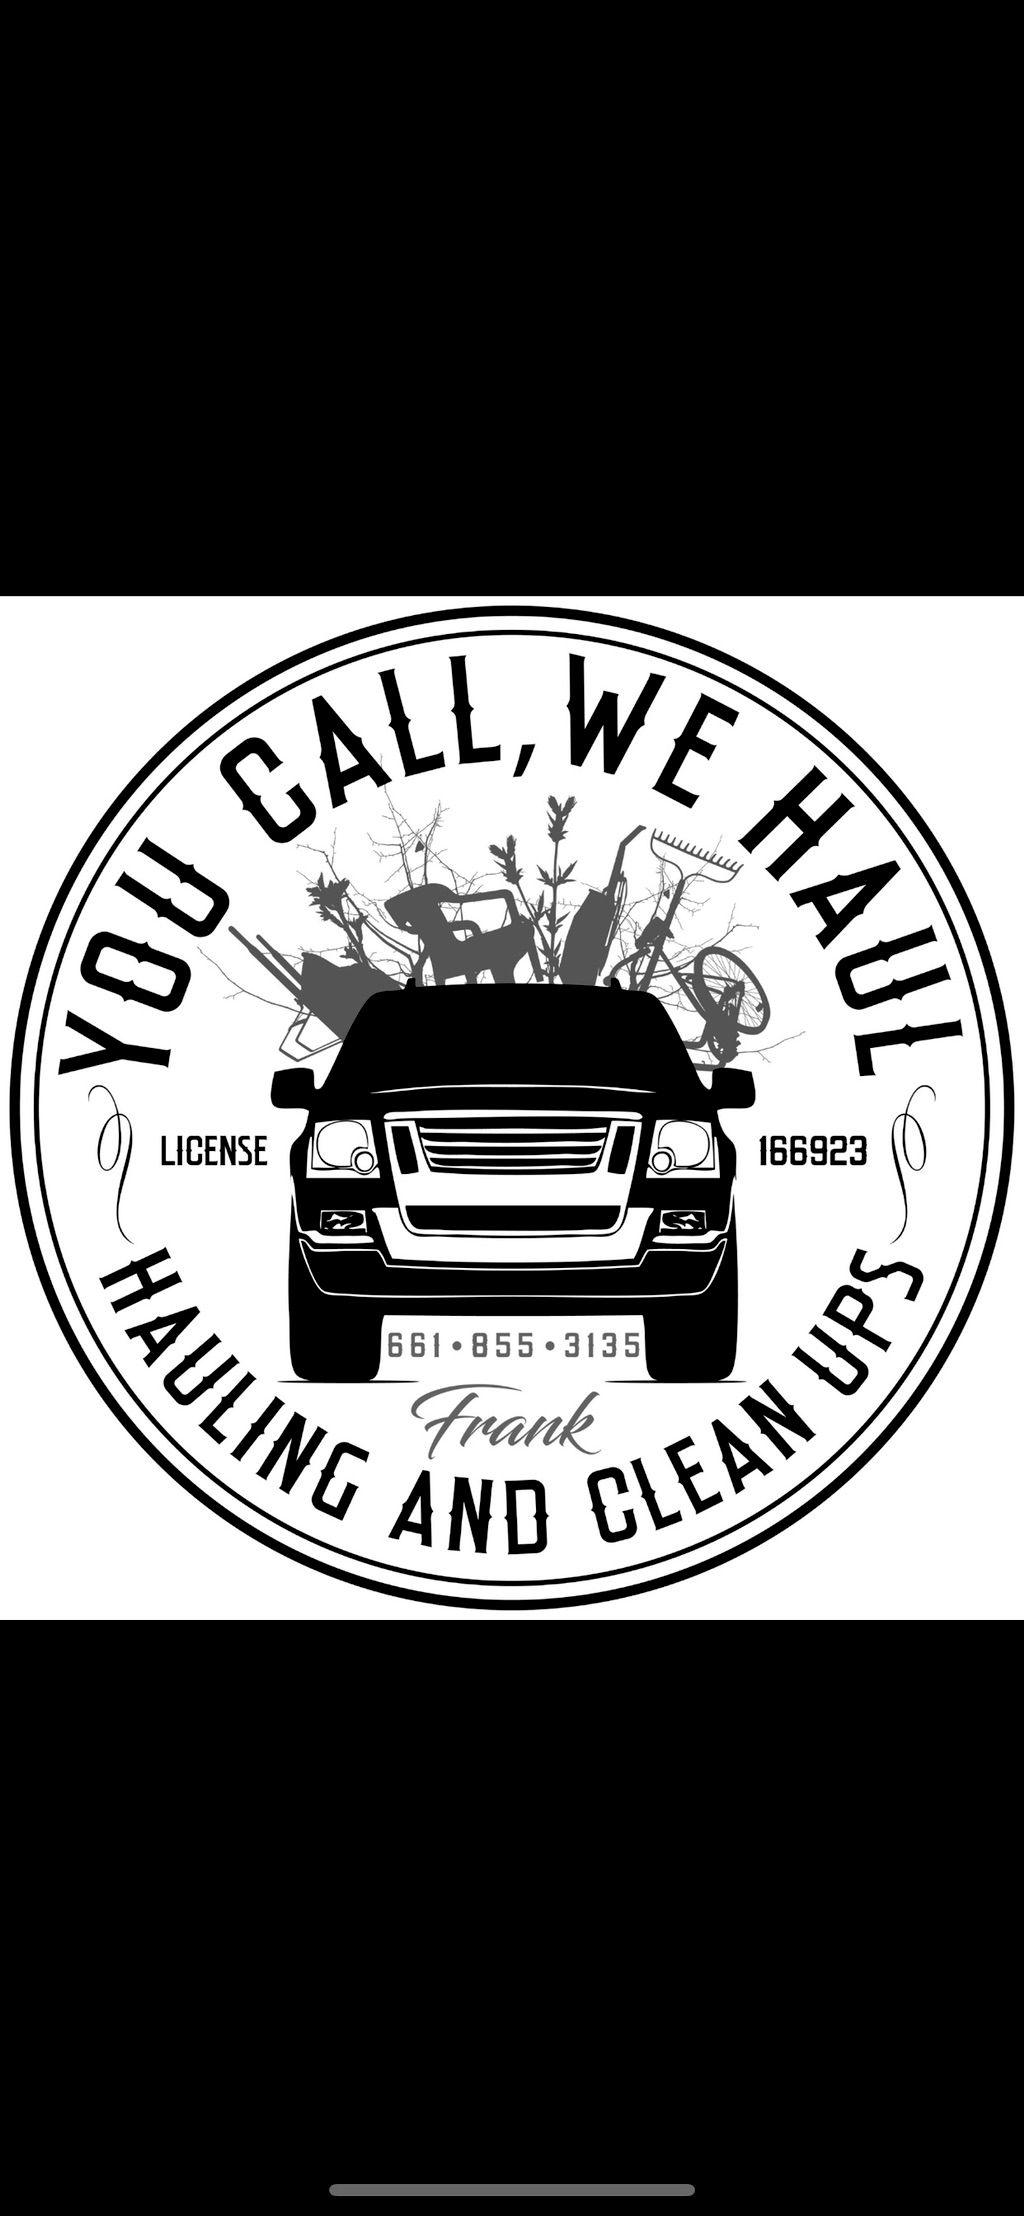 YOU CALL, WE HAUL